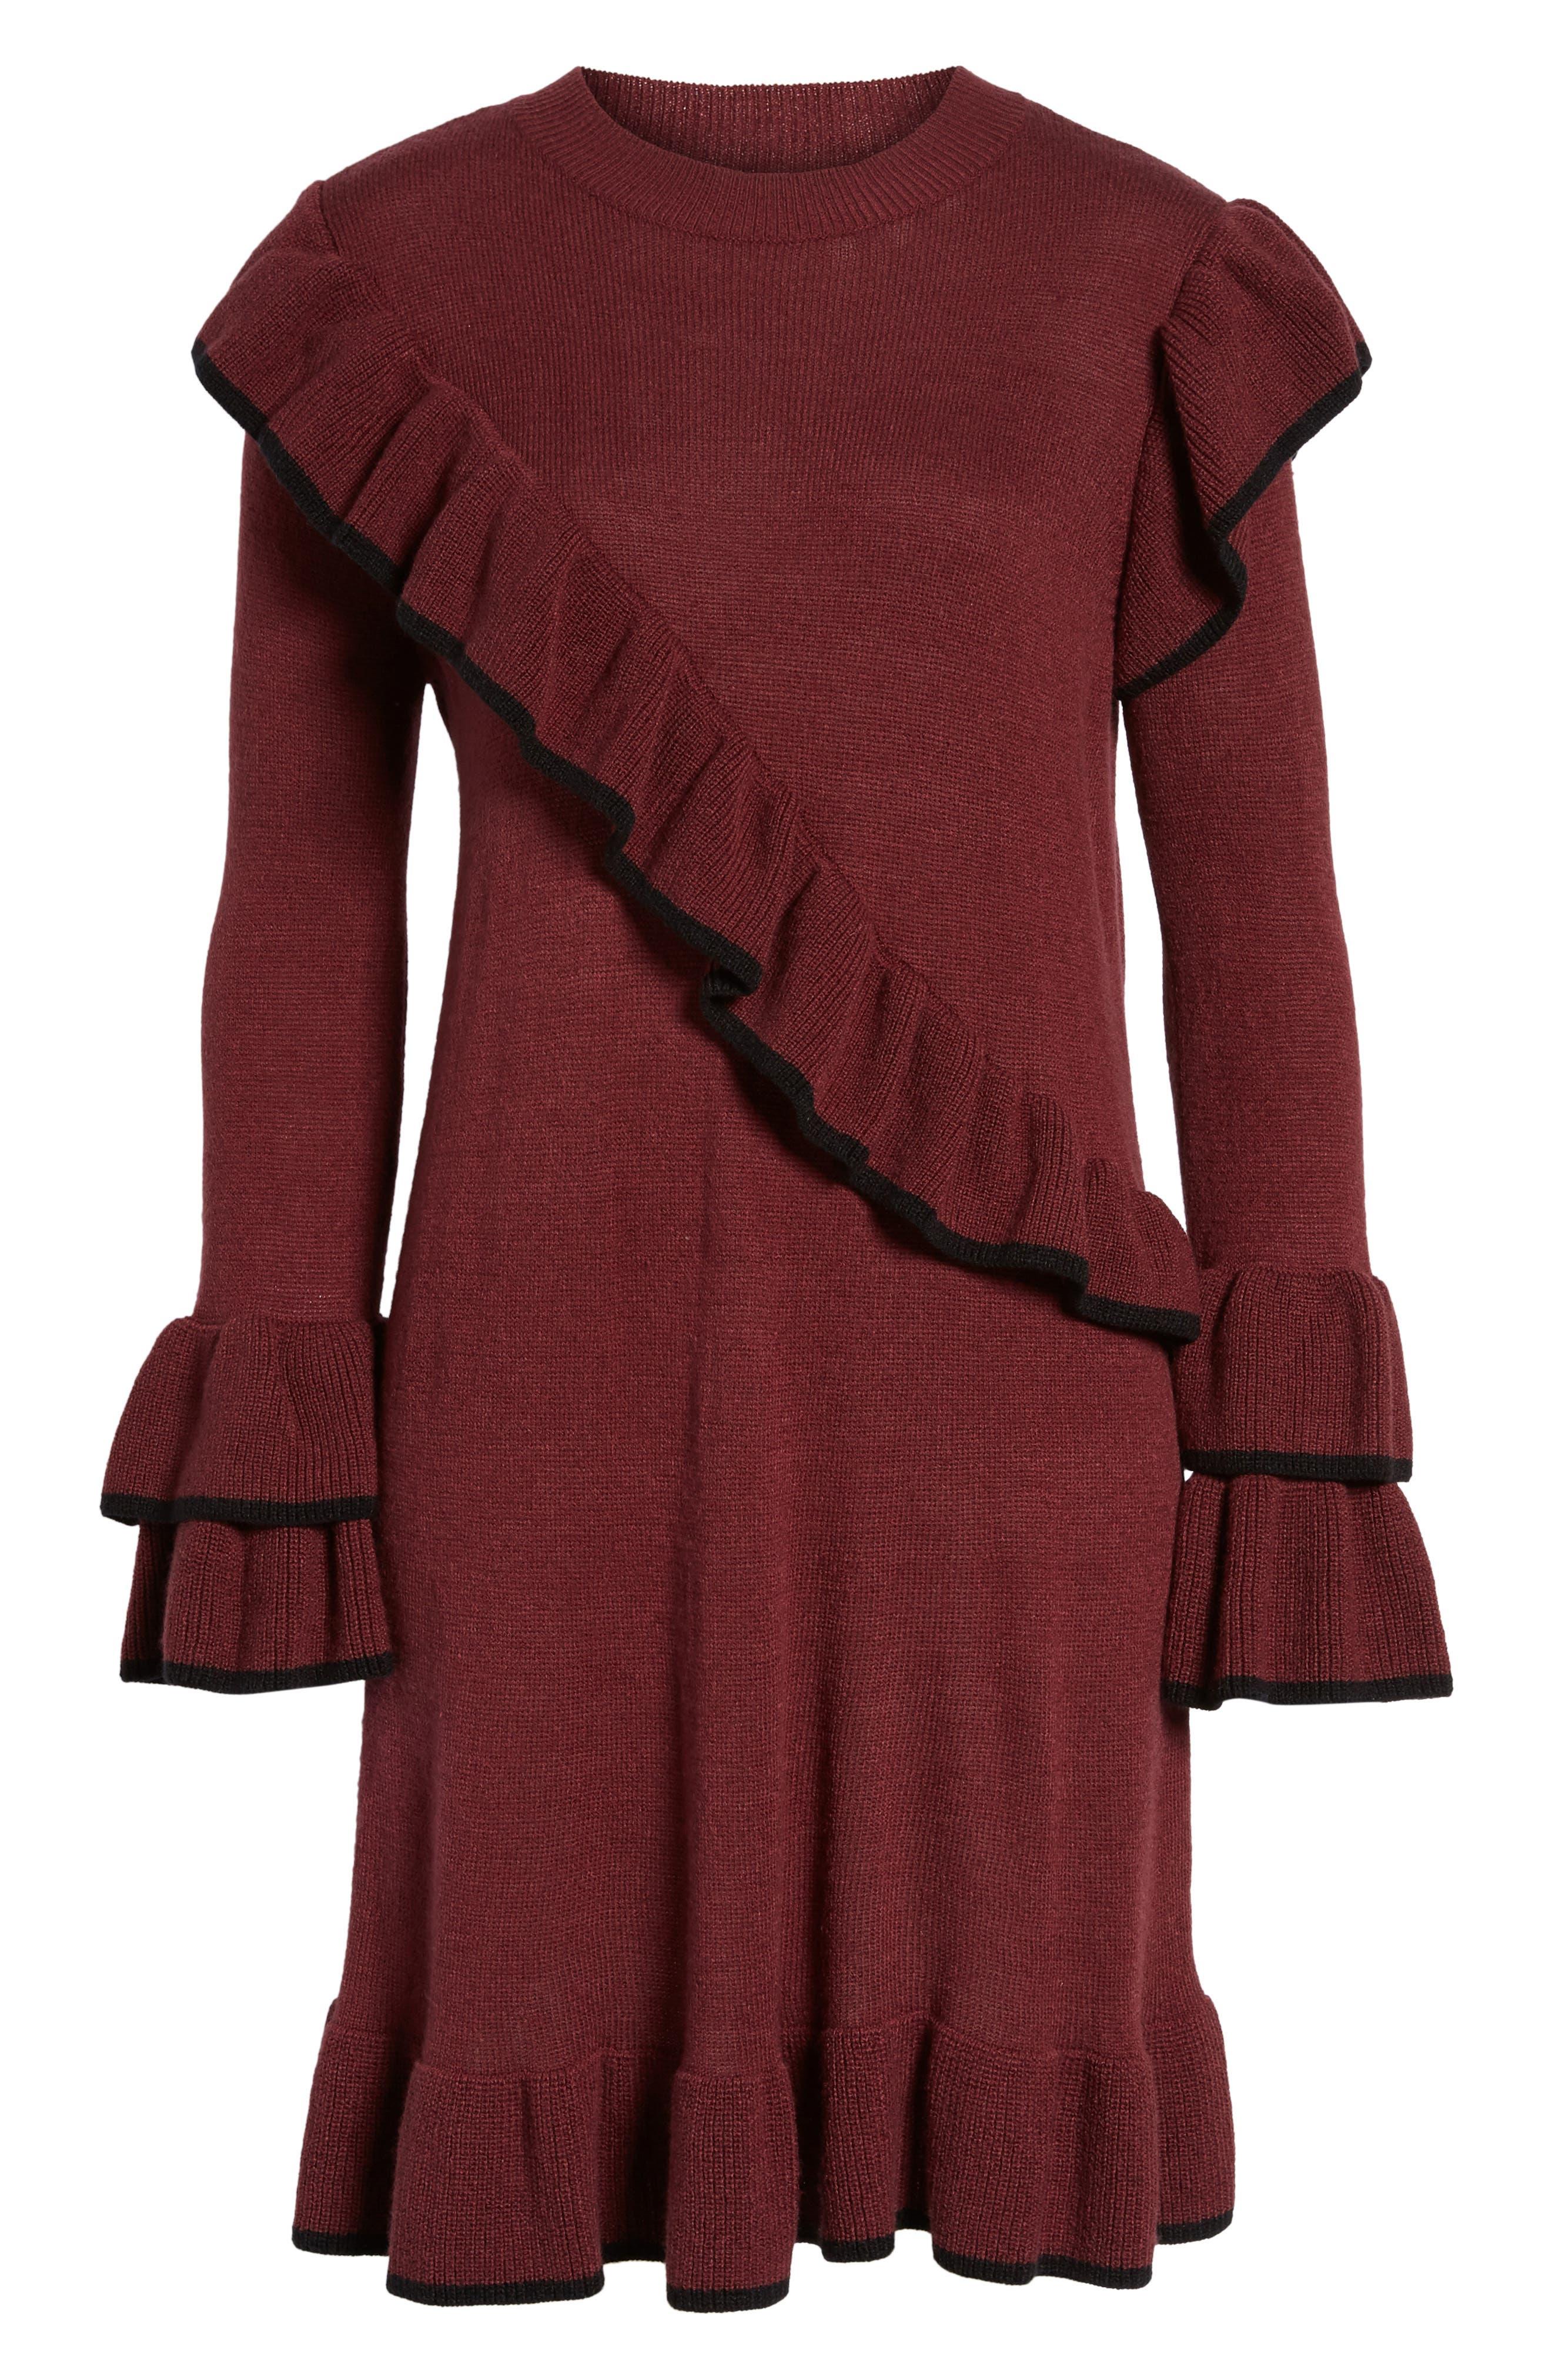 Ruffle Knit Sweater Dress,                             Alternate thumbnail 6, color,                             Burgundy Royale